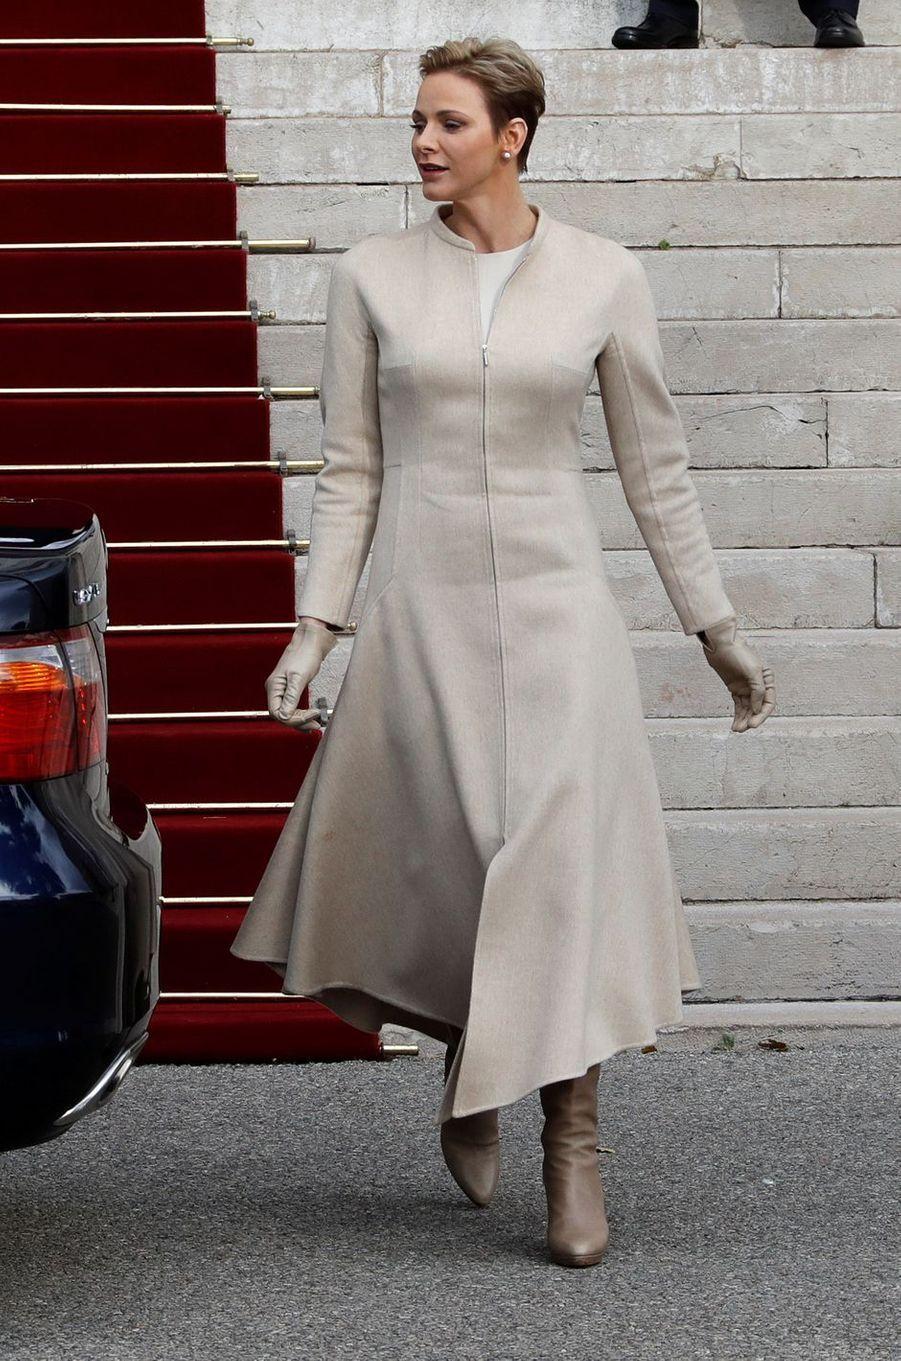 La princesse Charlène de Monaco à Monaco le 27 janvier 2017